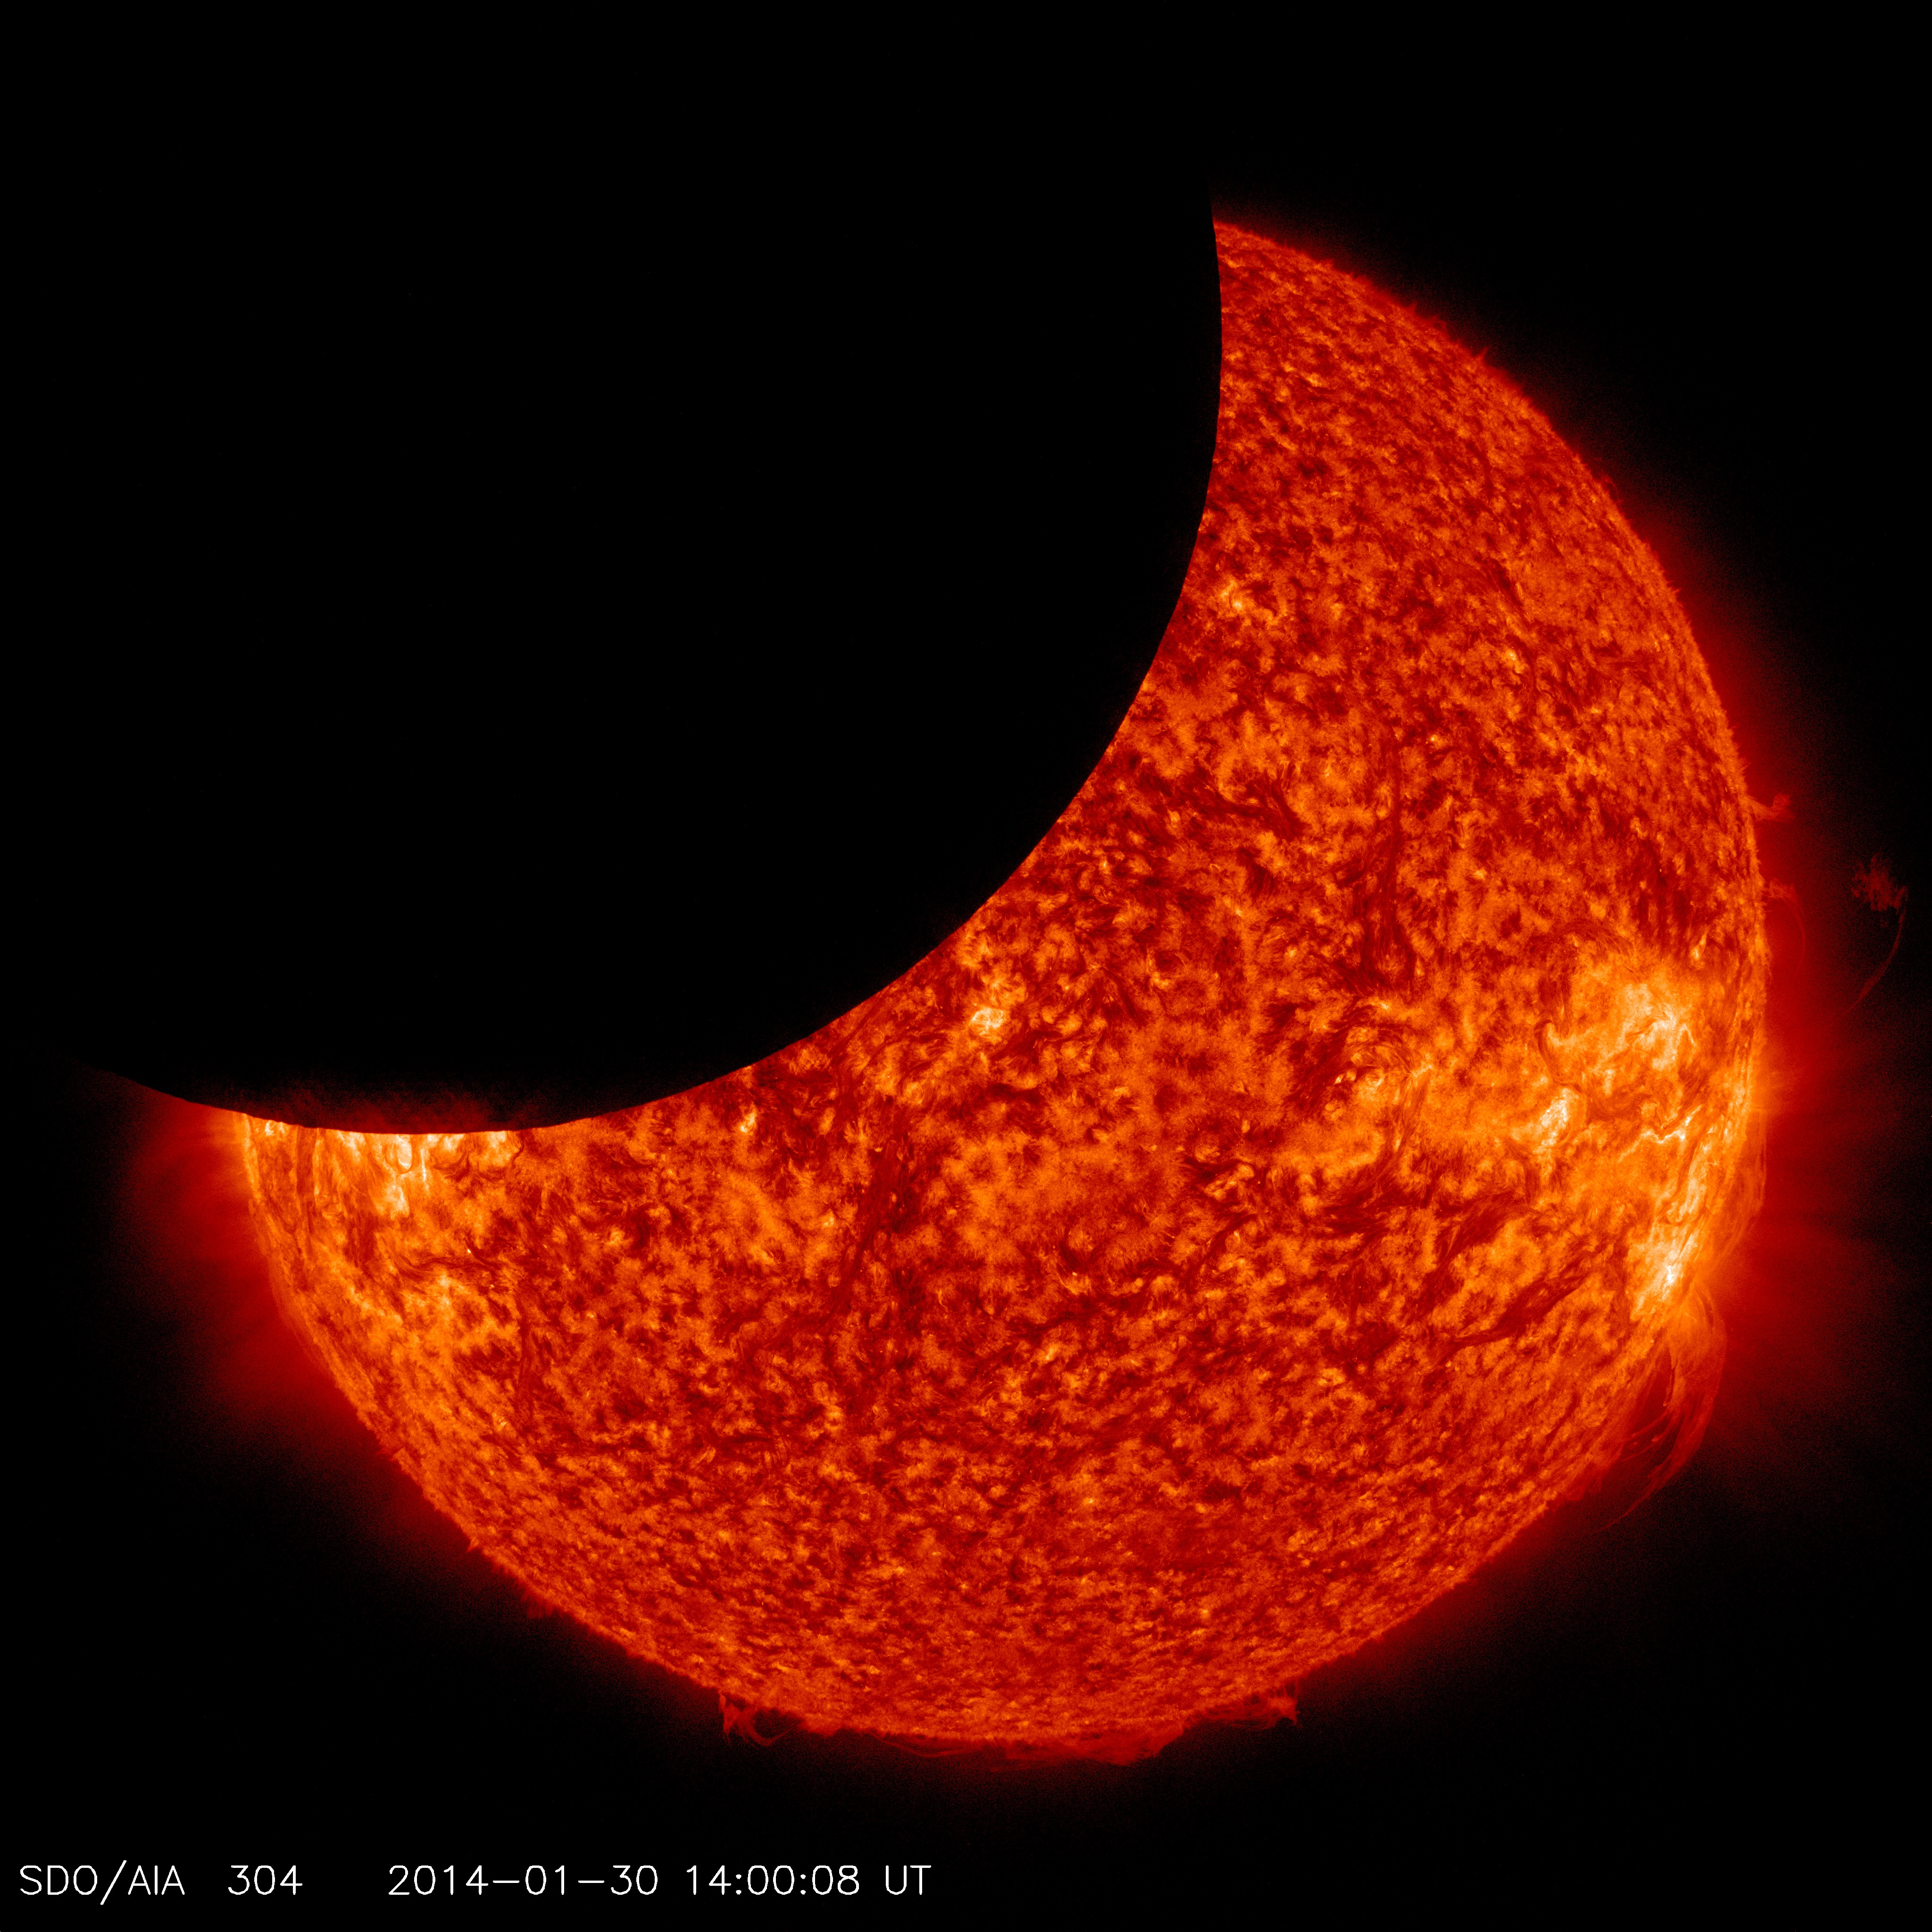 Colouring sheets of the lunar eclipse - 304_lunar_transit_14 00_ut Jpg